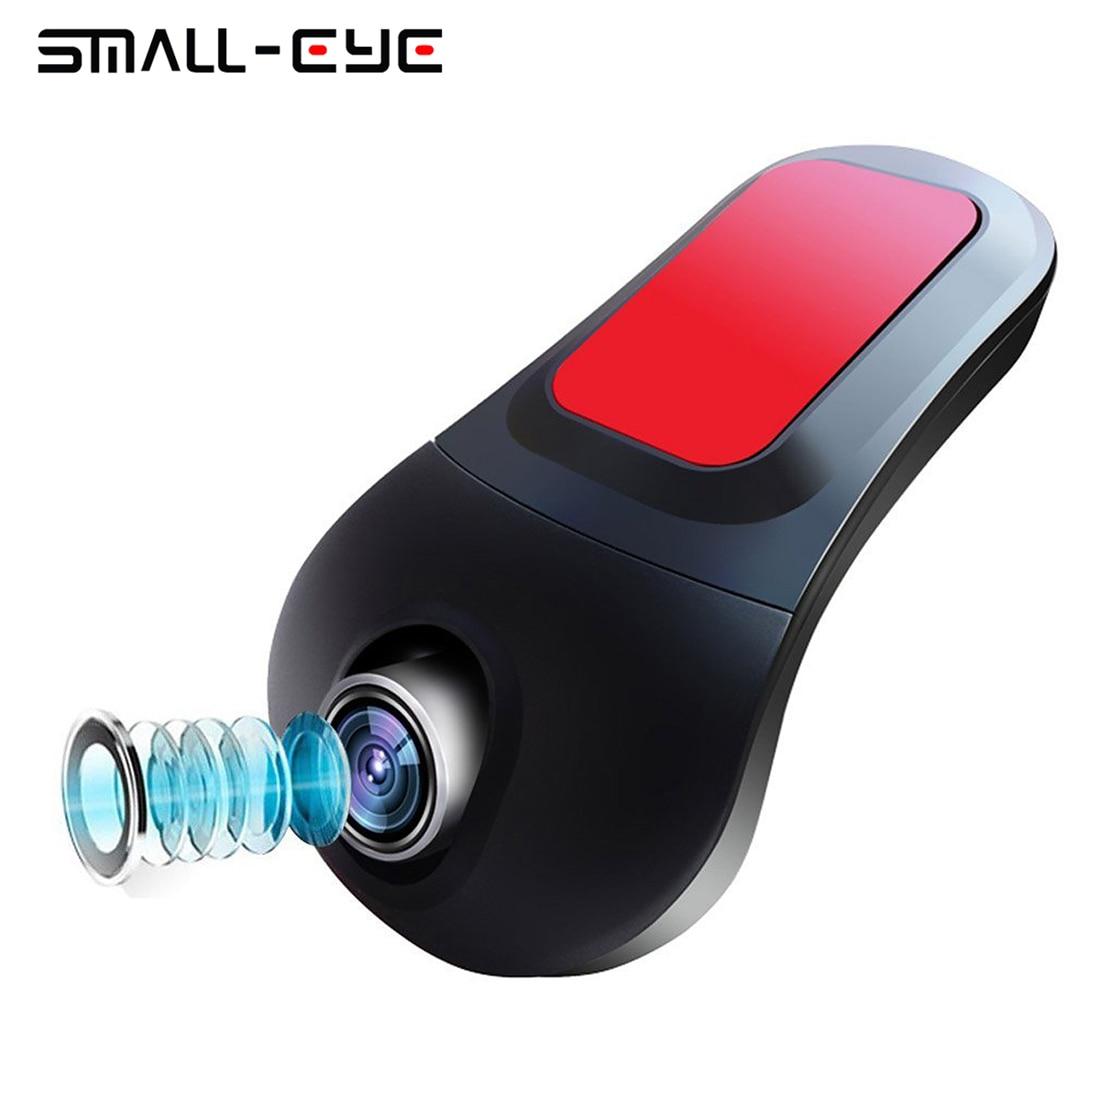 SMALL EYE Car DVR Registrator Dash font b Camera b font Cam Digital Video Recorder Camcorder